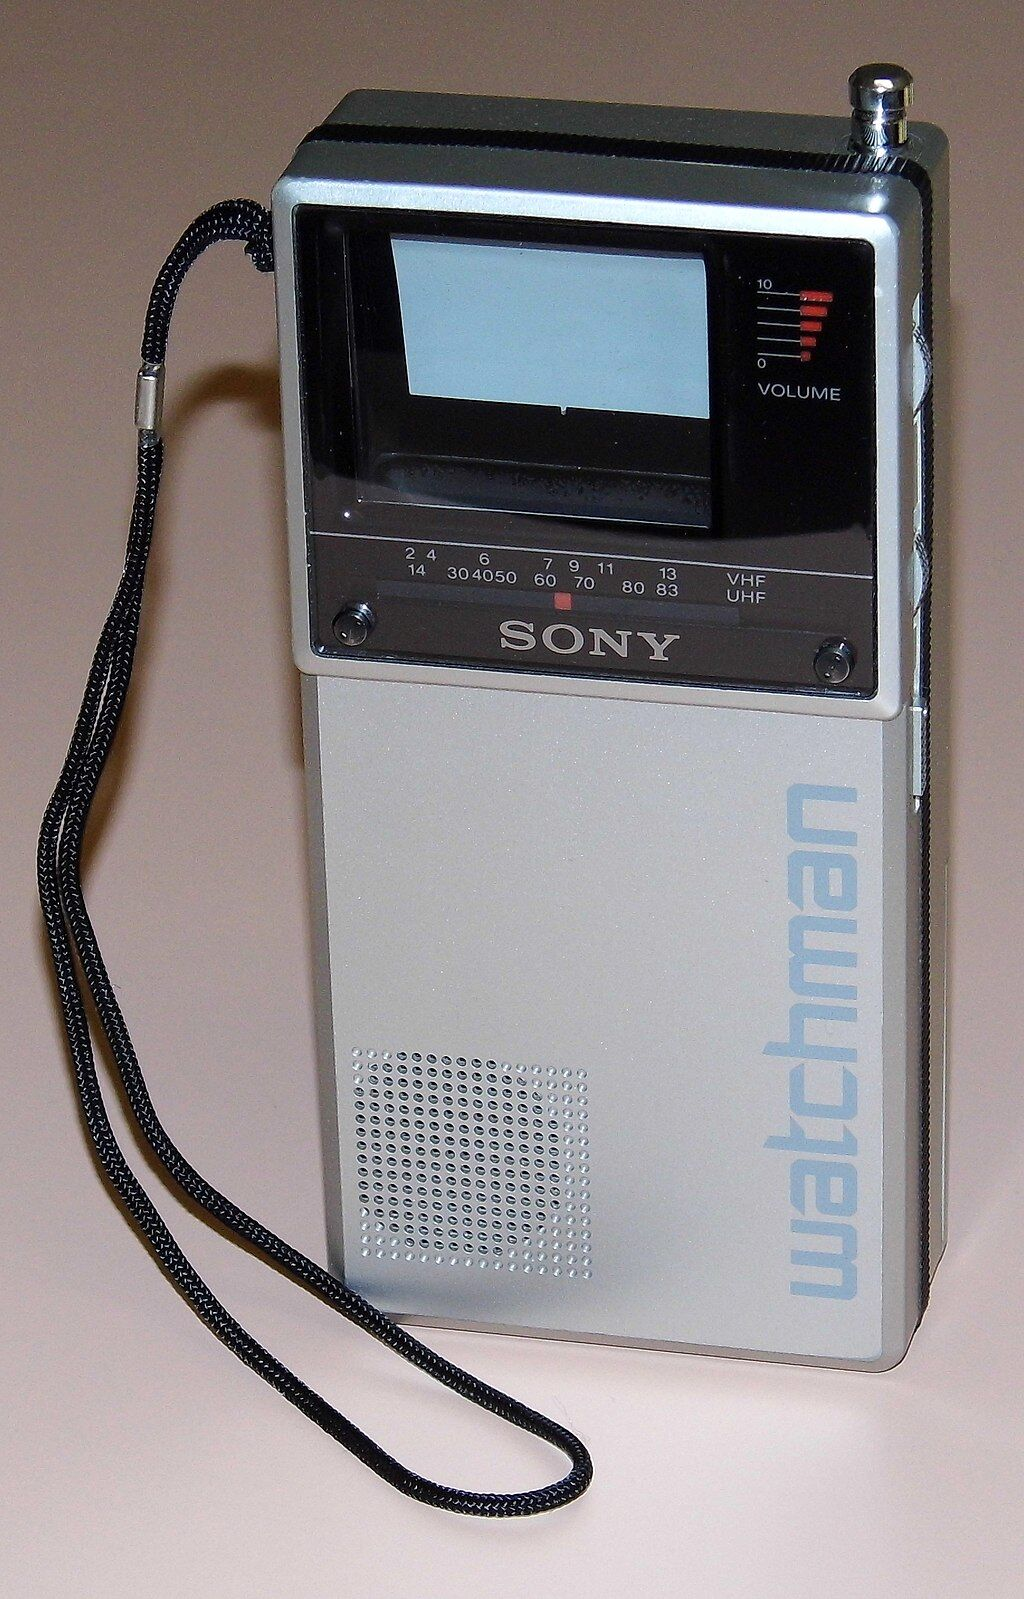 e Sony Watchman Handheld Flat Black And White TV, Model FD-20A. Photo by Joe Haupt, via Wikimedia Commons.